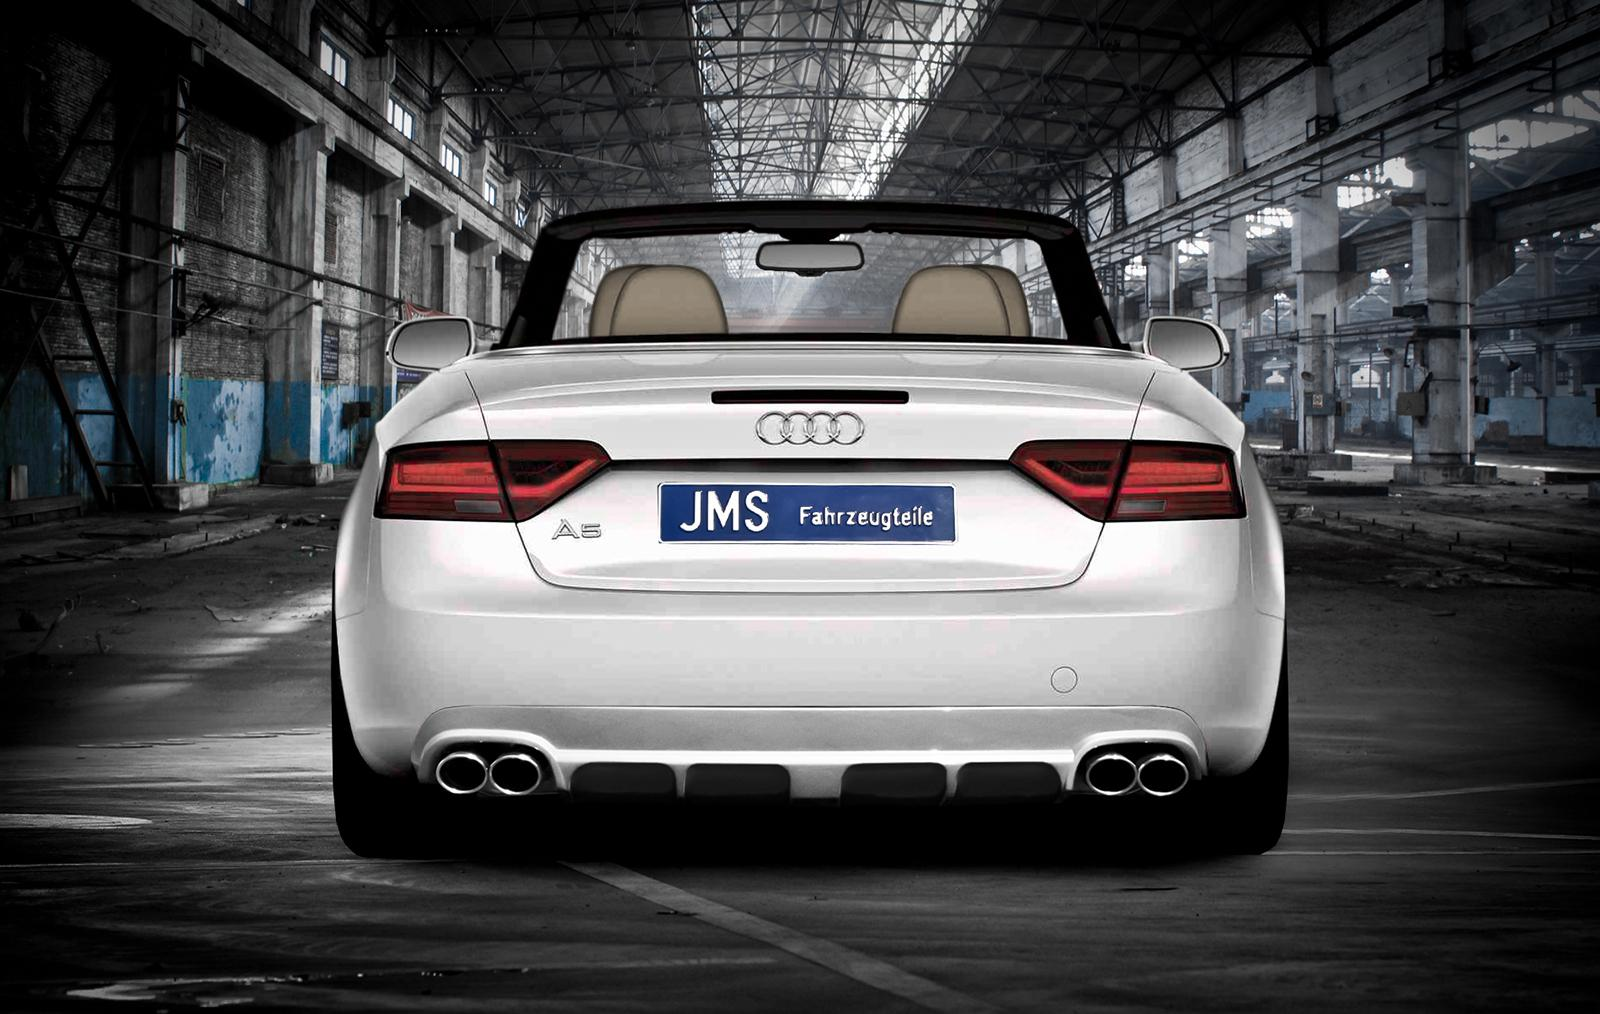 jms-a5-cabrio-rear